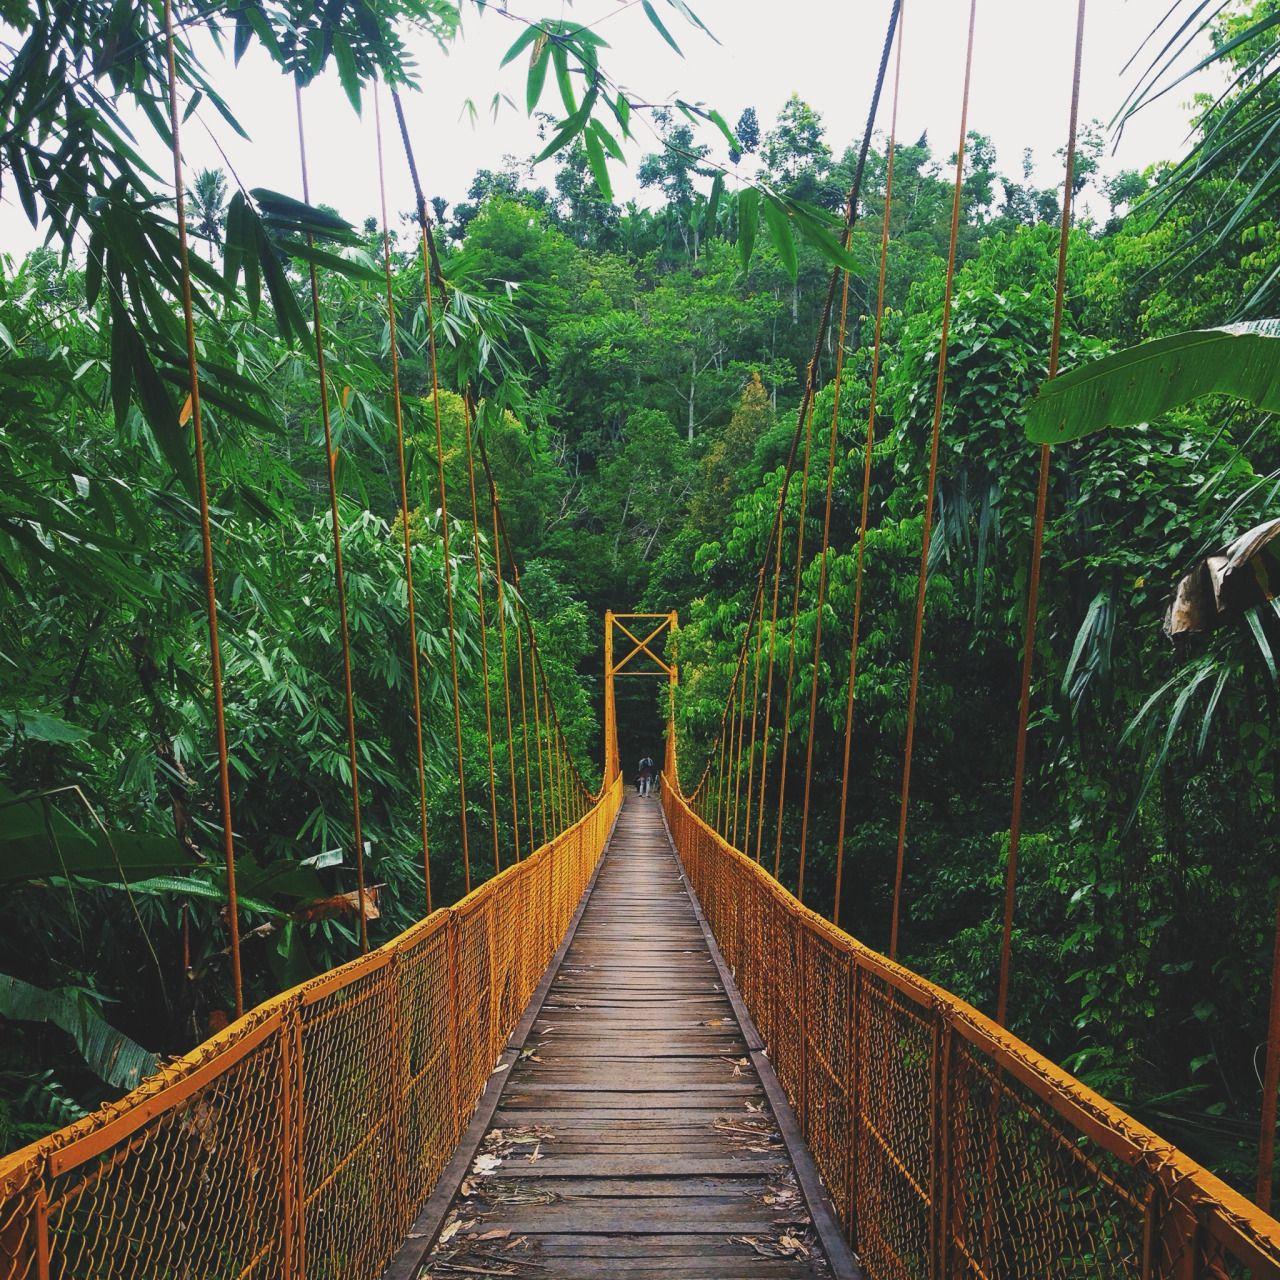 Jungle/tropical blog - let's have an adventure   Surf trip ...